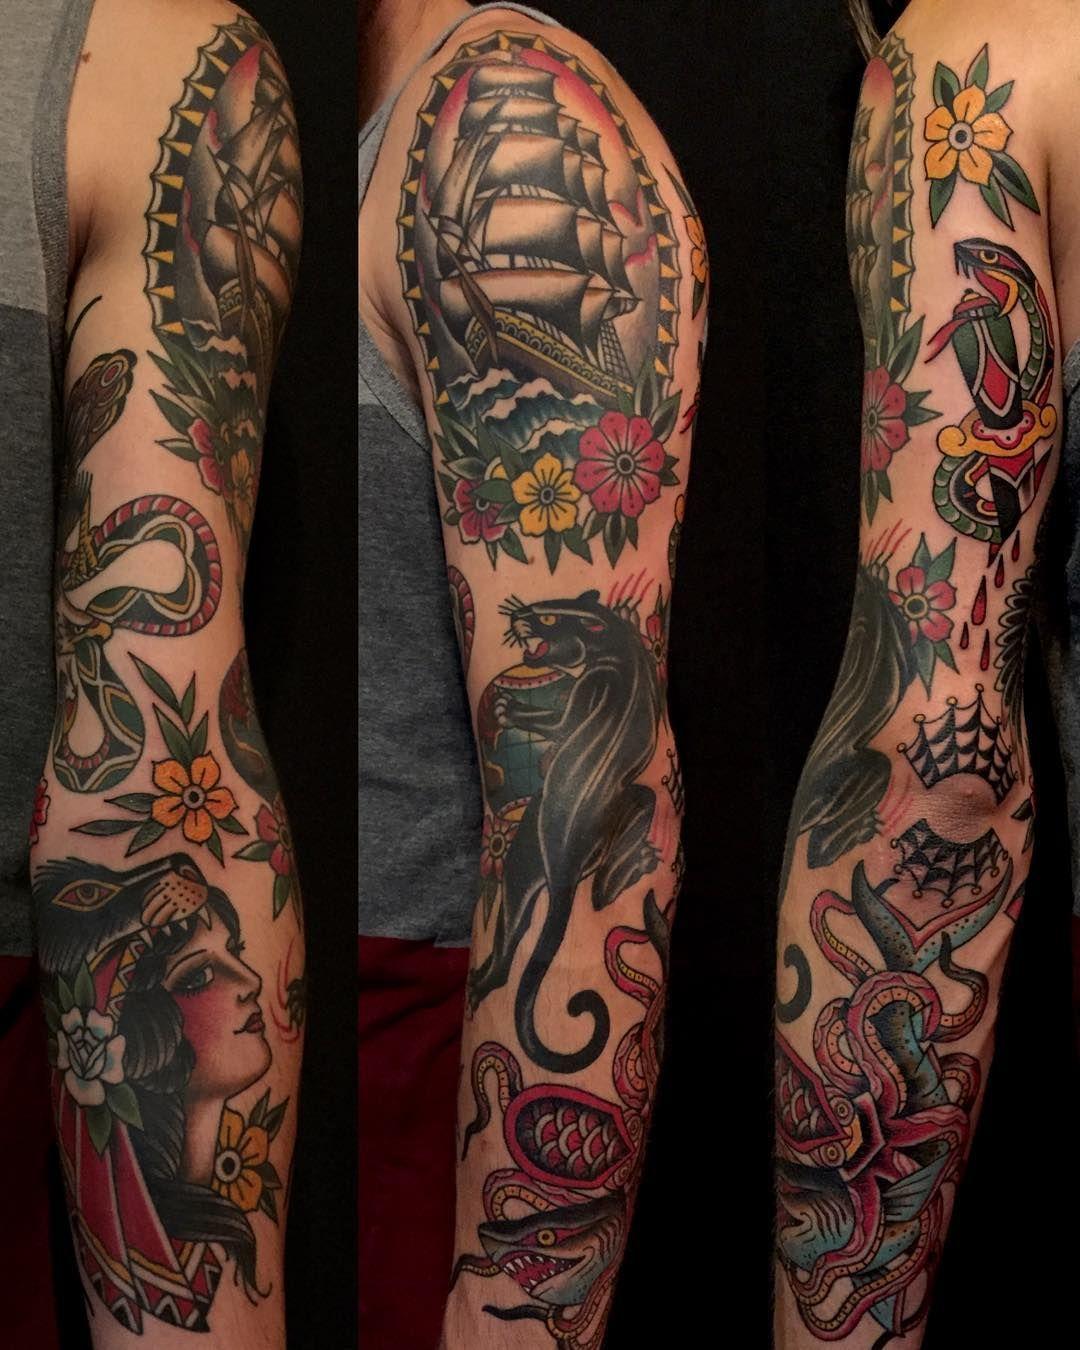 Image Result For Traditional Tattoo Sleeve Mangas Del Tatuaje Tradicionales Tatuajes Tradicionales Tatuaje Yakuza